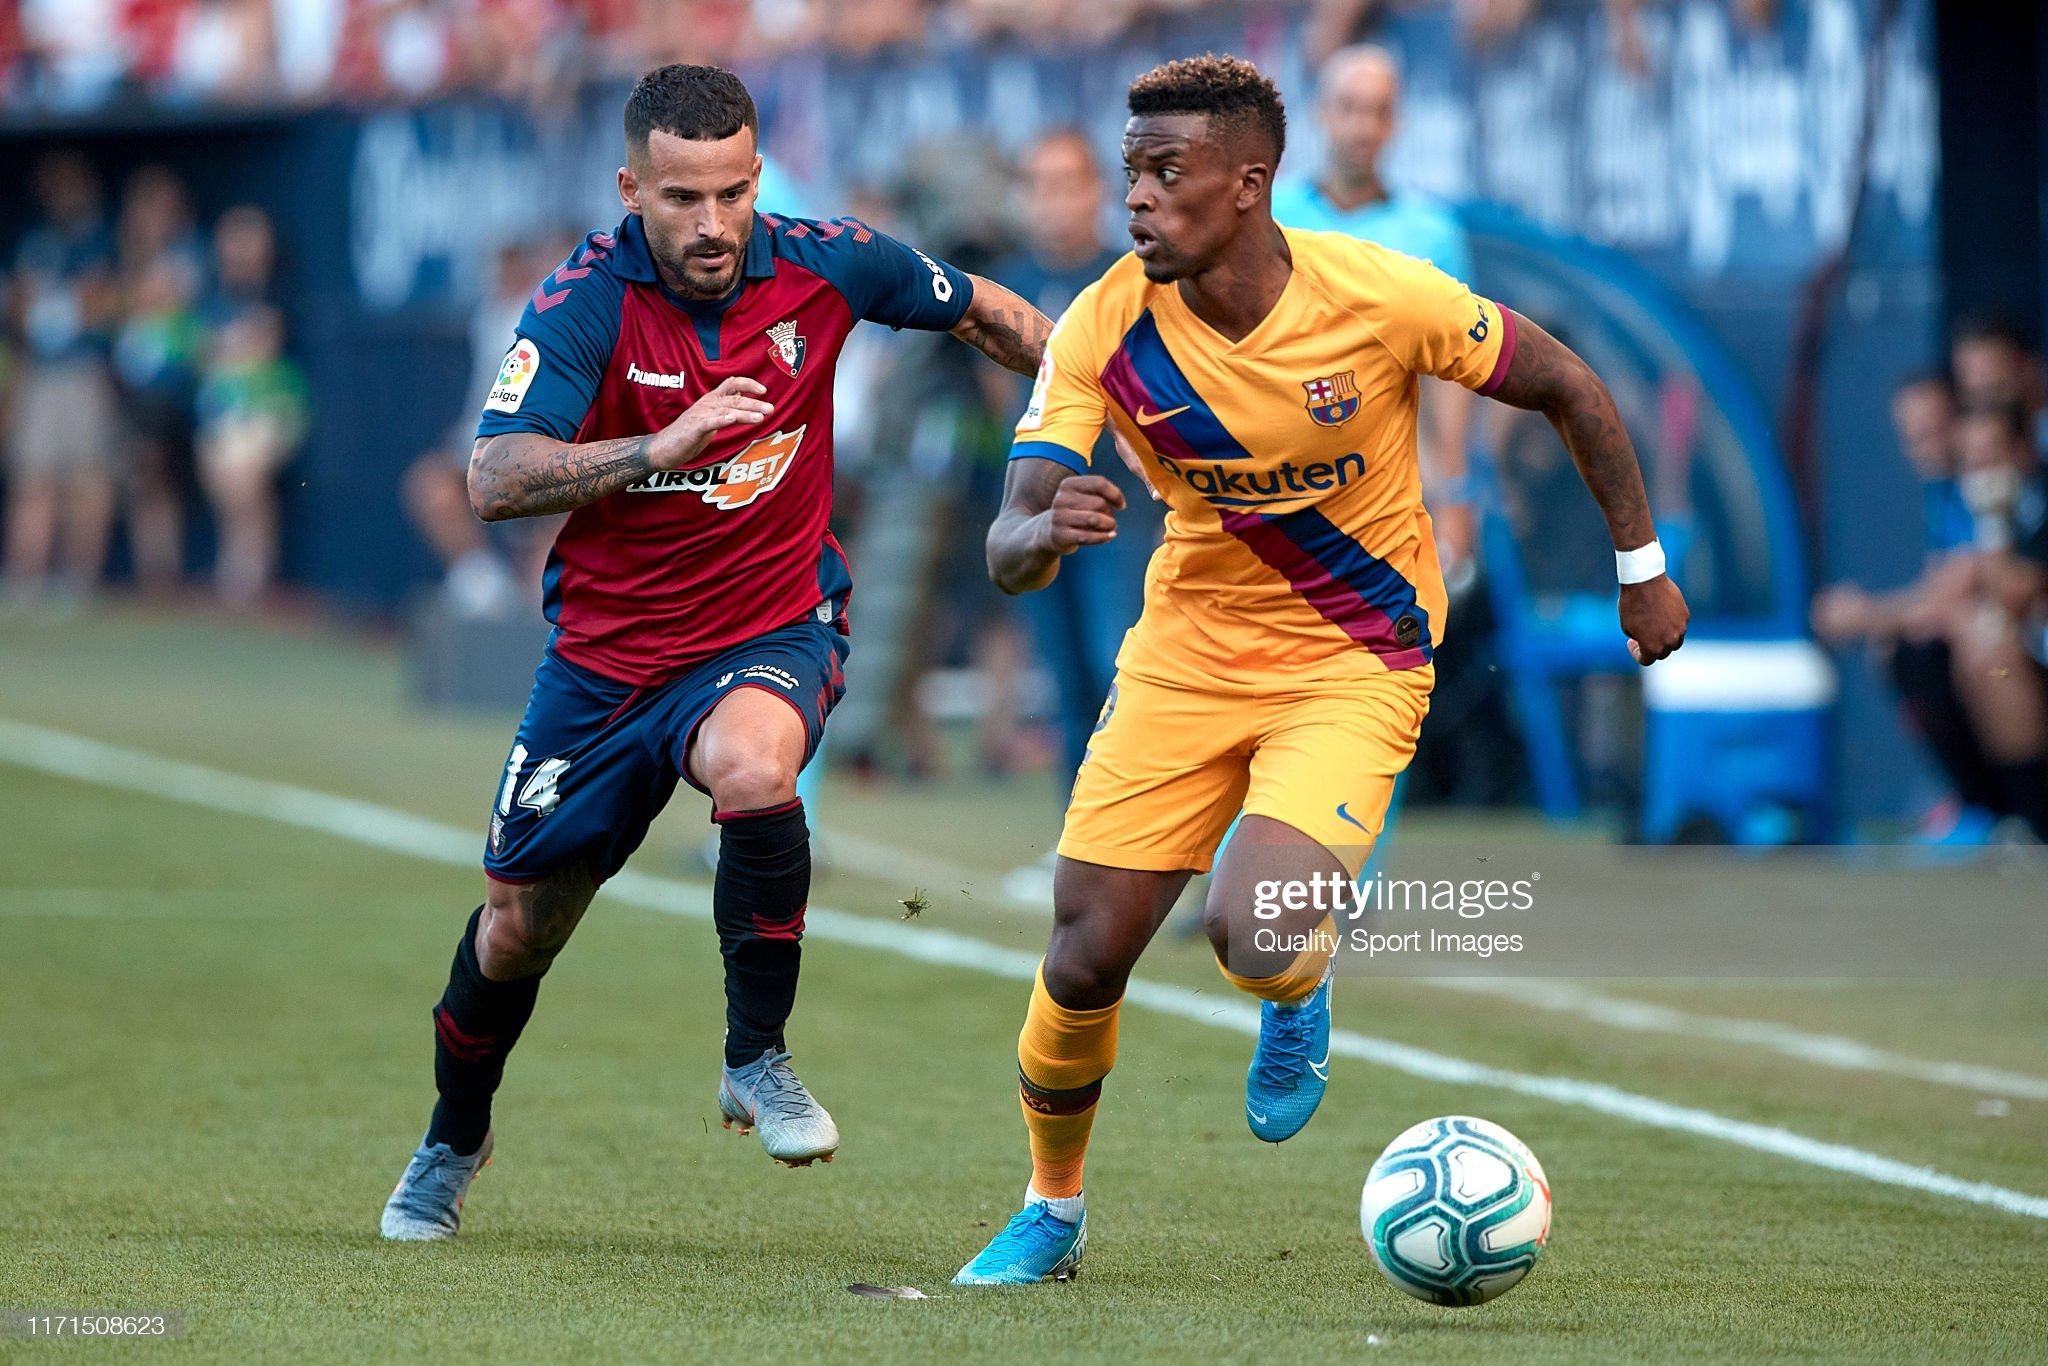 صور مباراة : أوساسونا - برشلونة 2-2 ( 31-08-2019 )  Ruben-garcia-of-ca-osasuna-competes-for-the-ball-with-nelson-semedo-picture-id1171508623?s=2048x2048